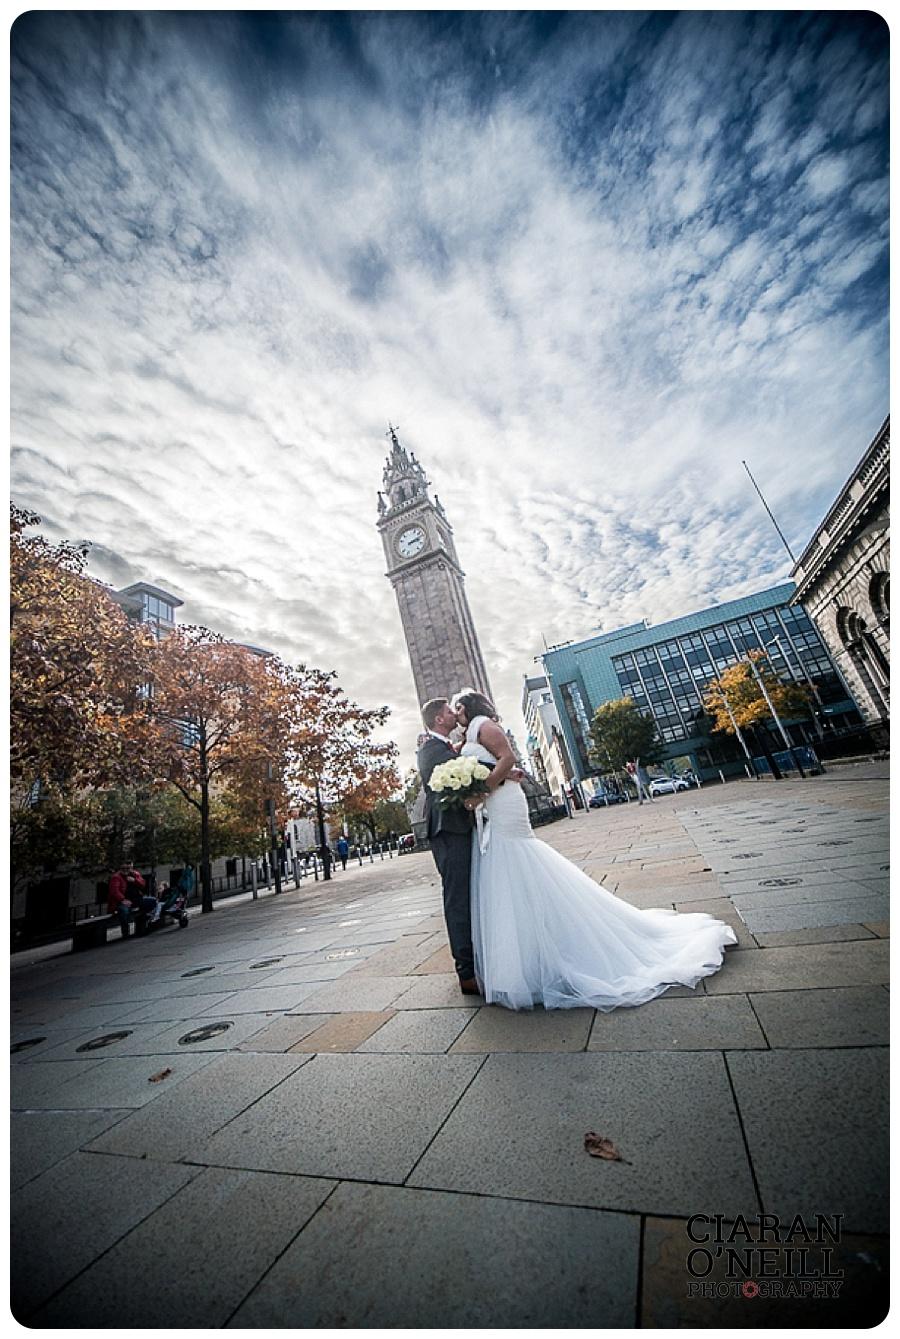 tara-sean-pols-wedding-at-ramada-plaza-belfast-by-ciaran-oneill-photography-14